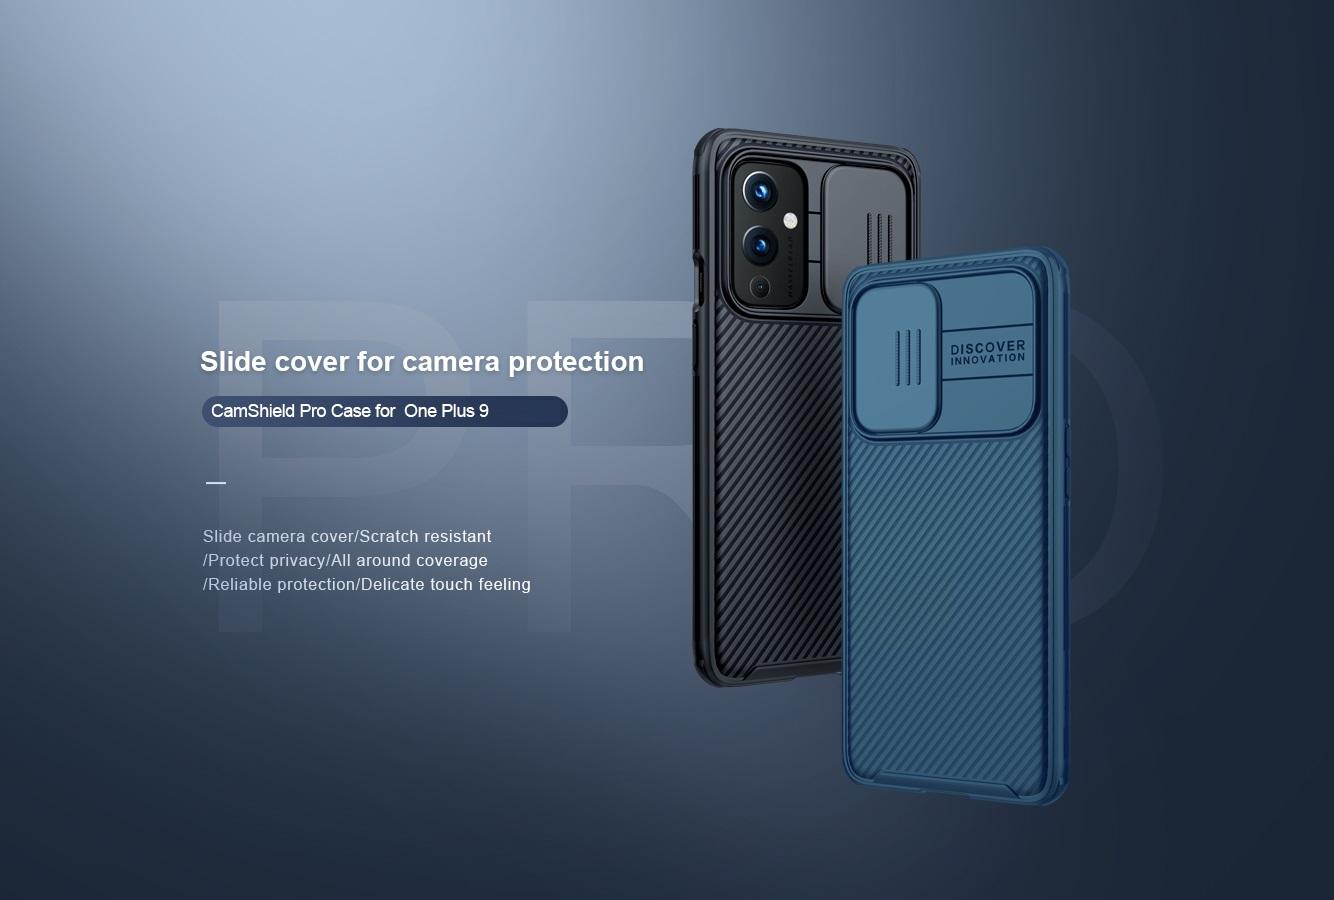 OnePlus_9_CamShield_Pro_Case-01.jpg